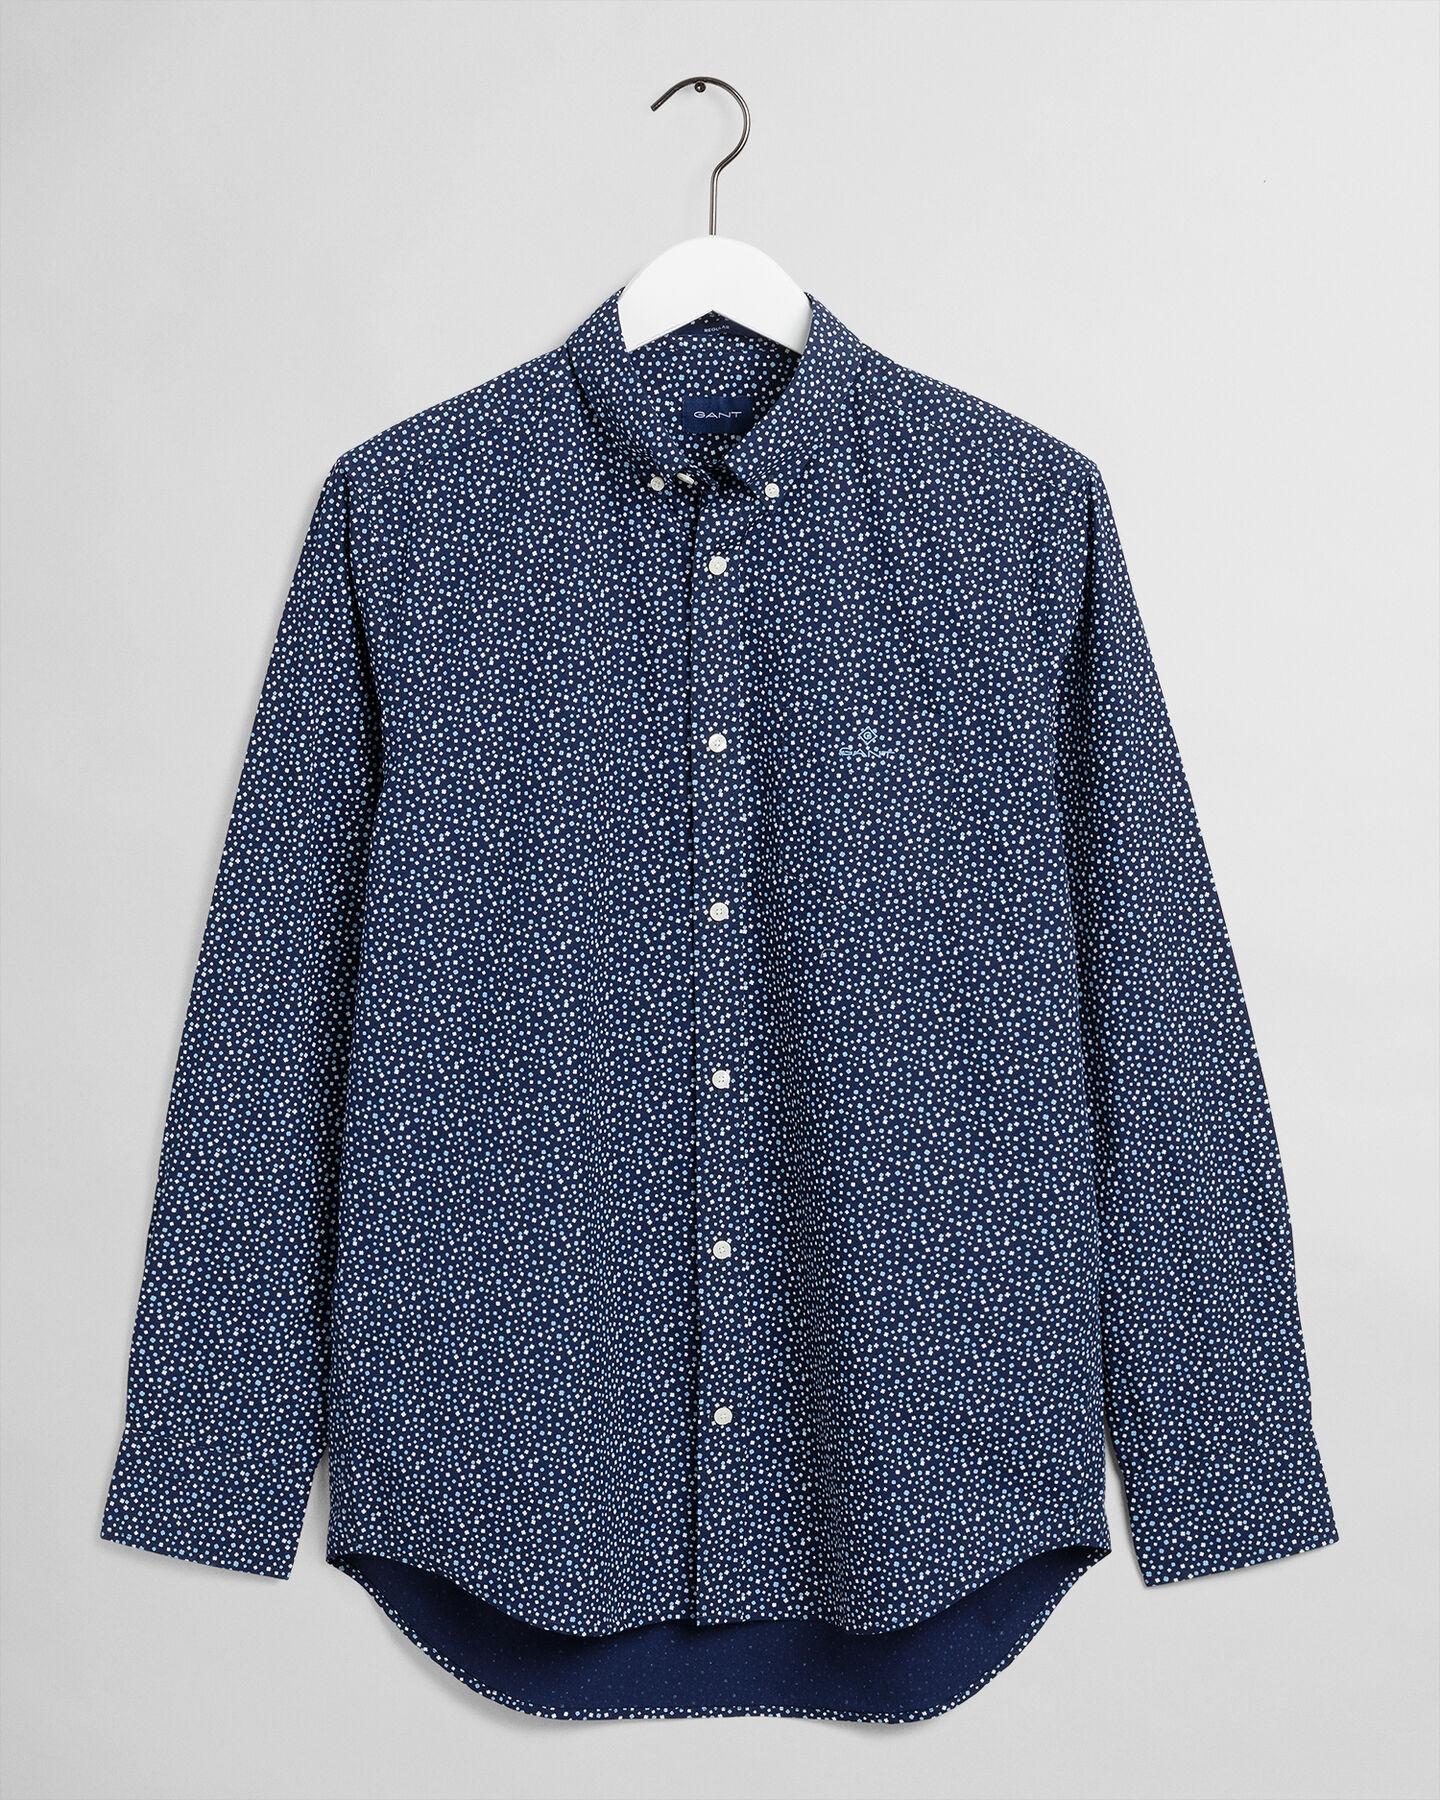 Regular Fit Star Burst Shirt